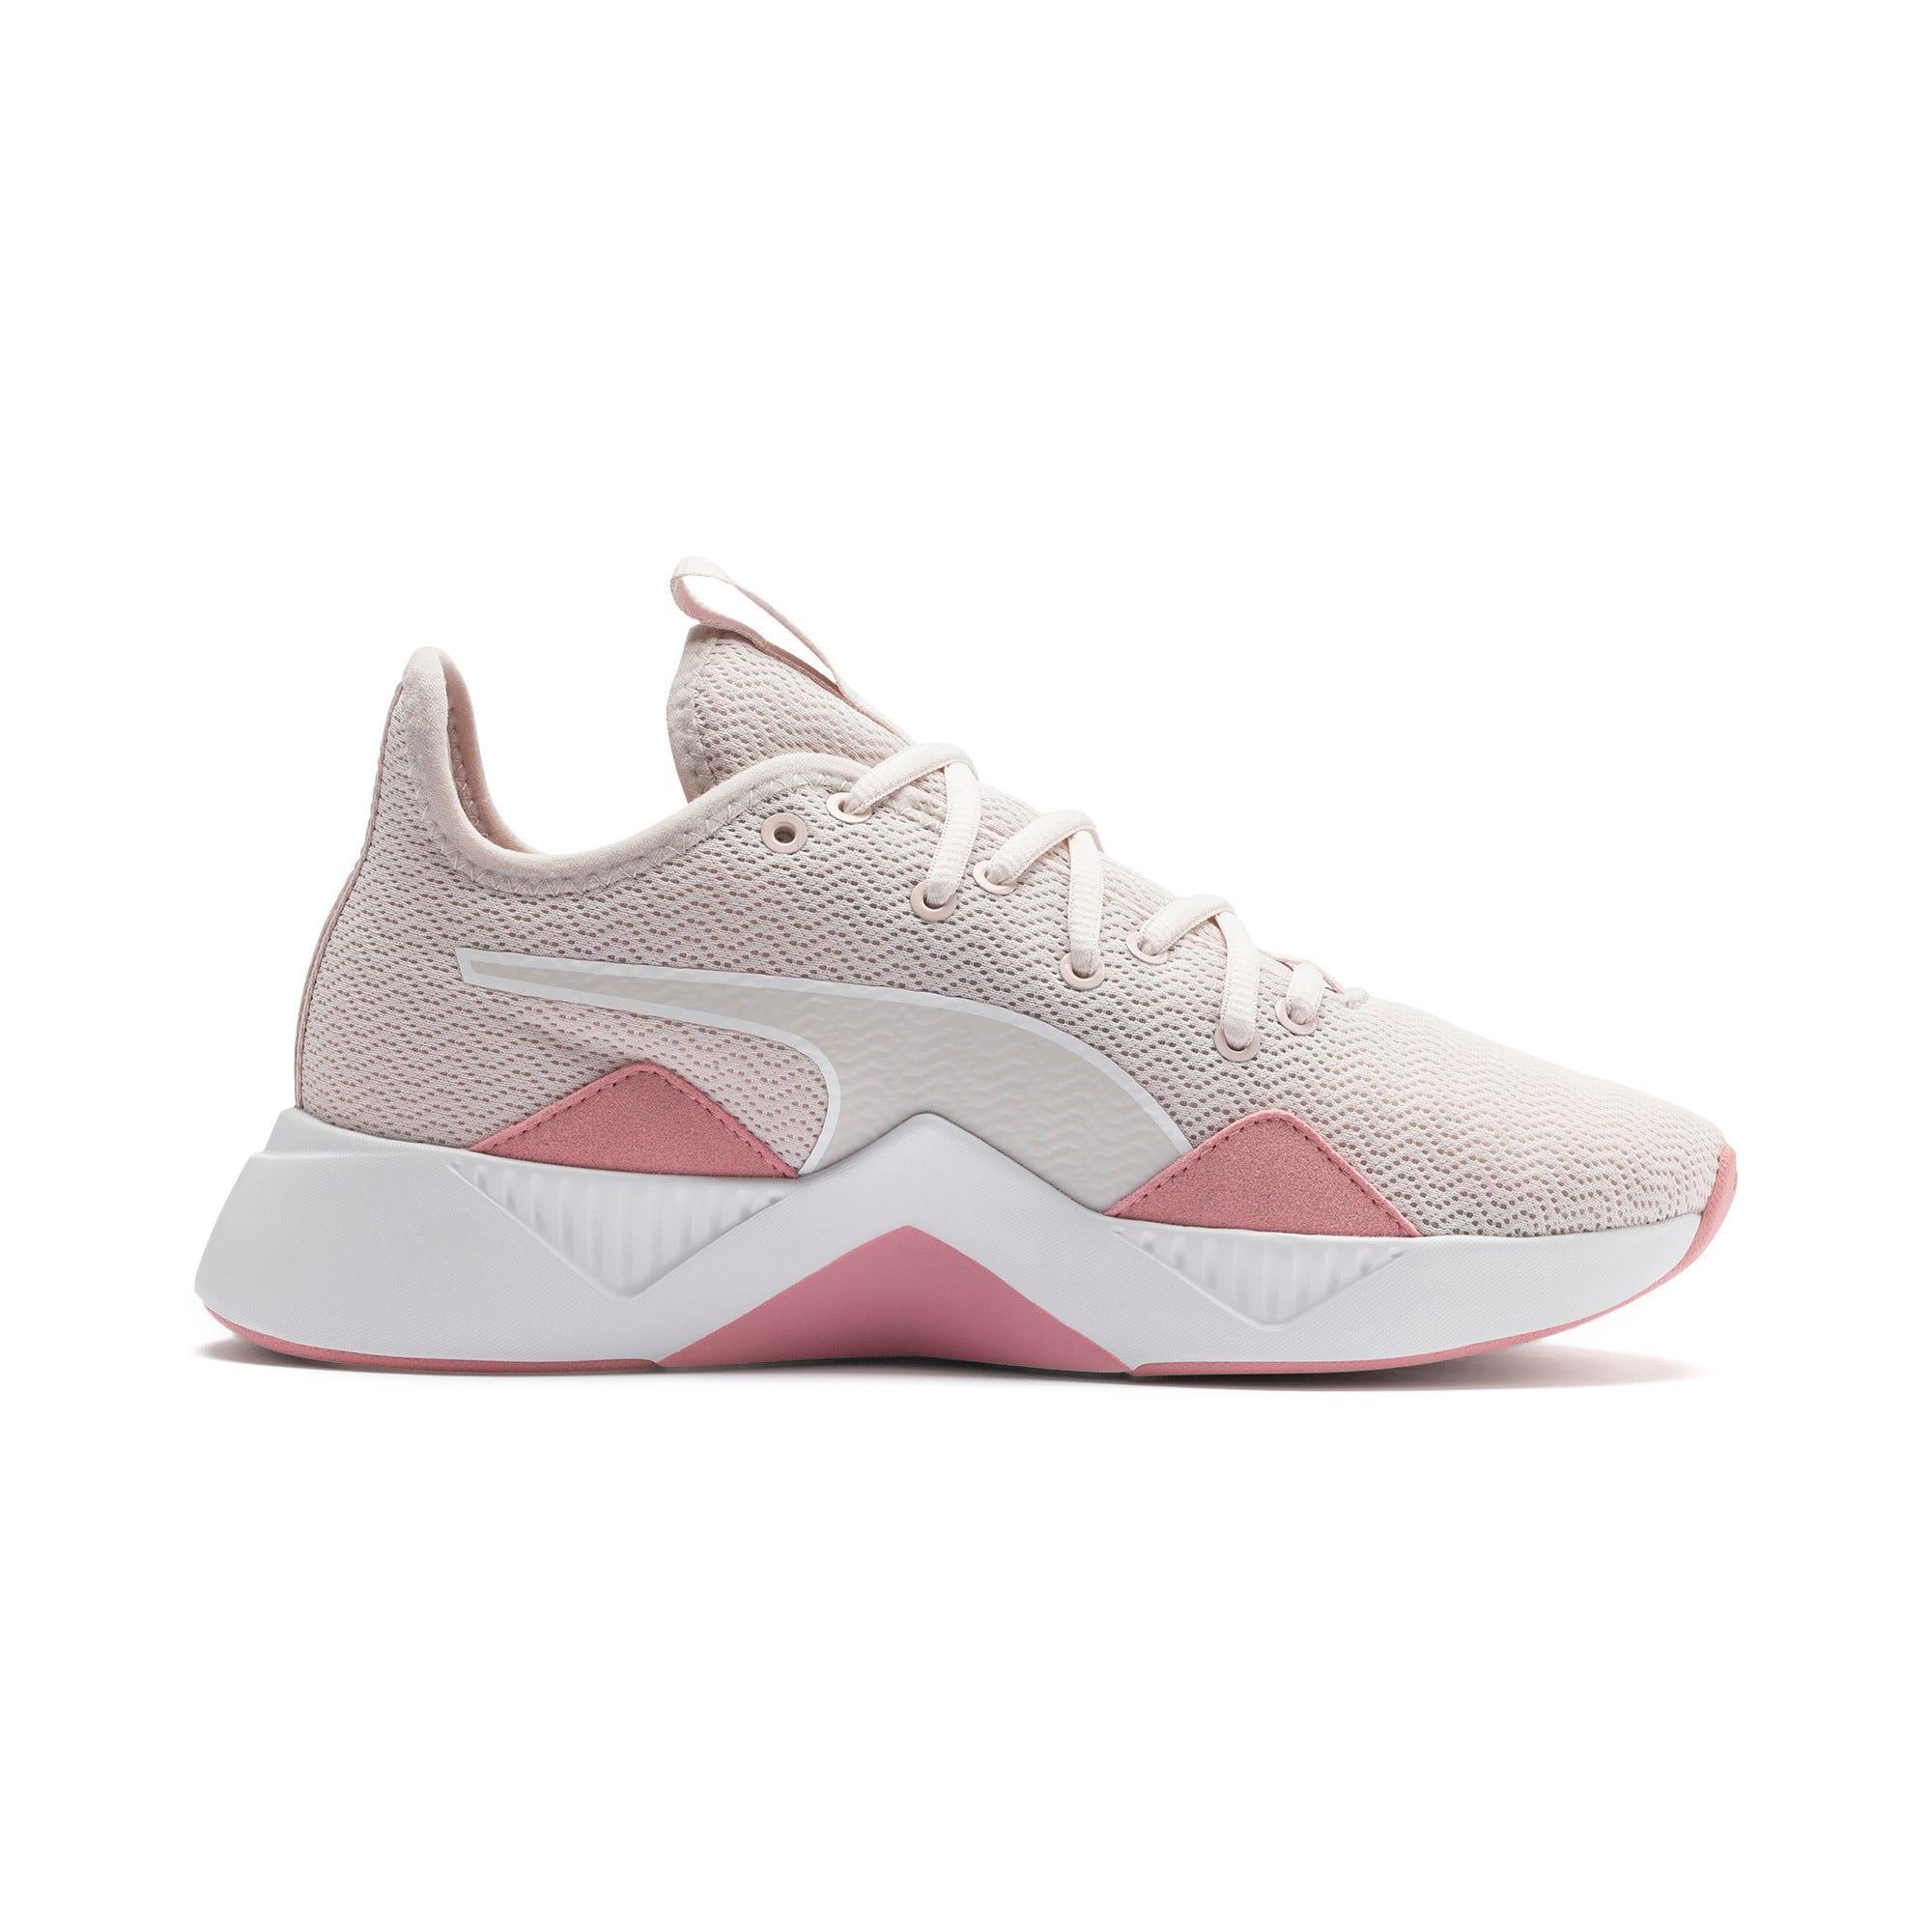 Thumbnail 6 of Incite FS Shift Women's Training Shoes, Pastel Parchment-Rose-White, medium